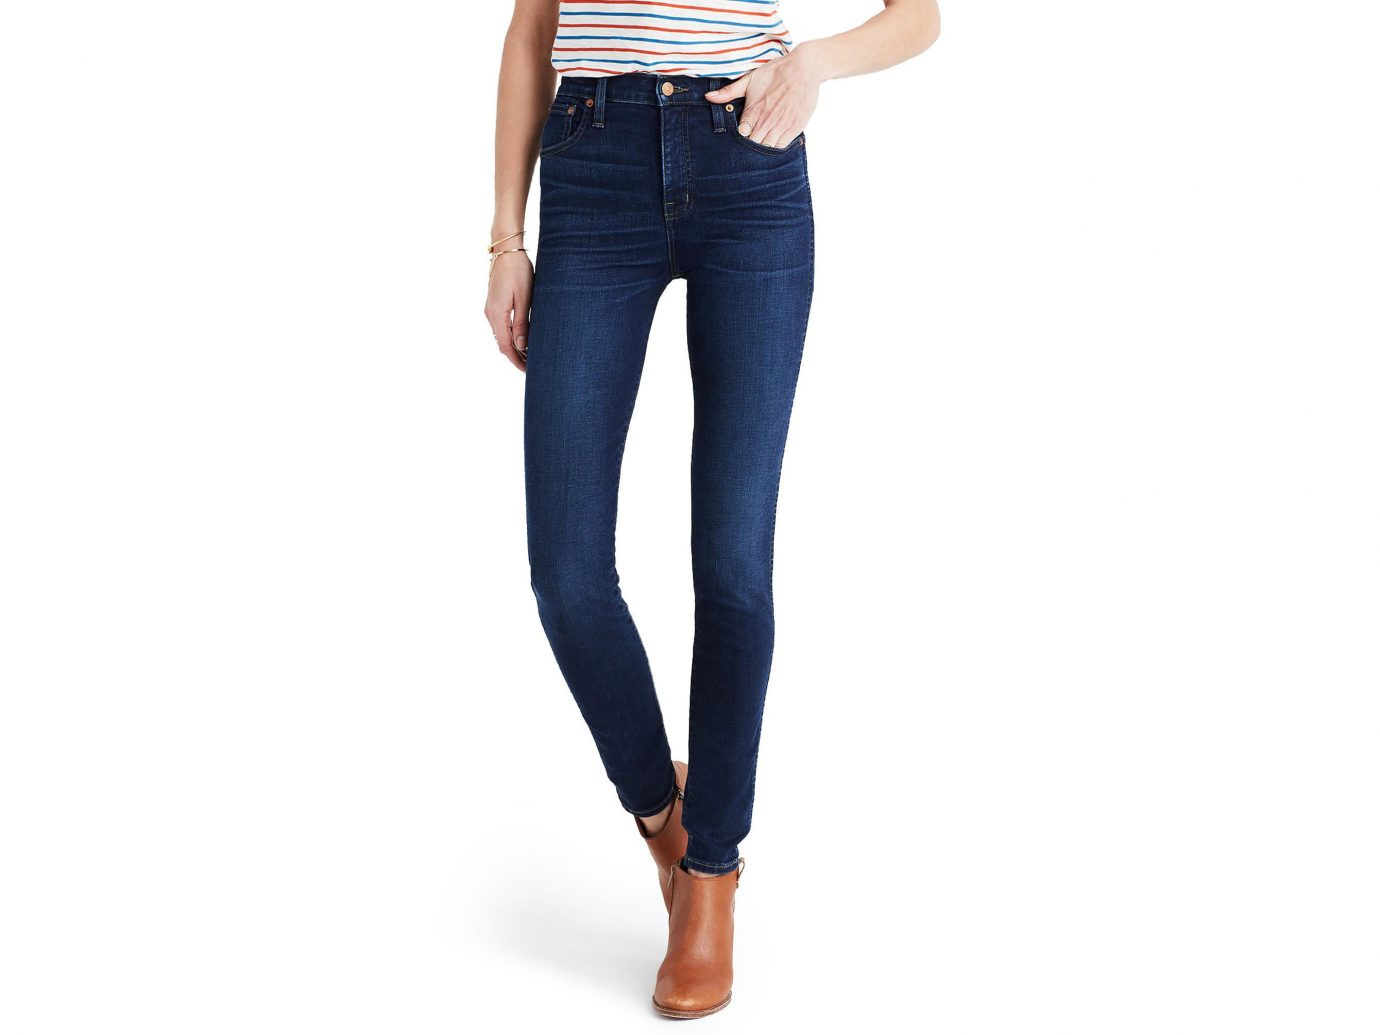 France Style + Design Travel Shop clothing jeans denim waist trouser electric blue joint trousers leggings abdomen trunk pocket